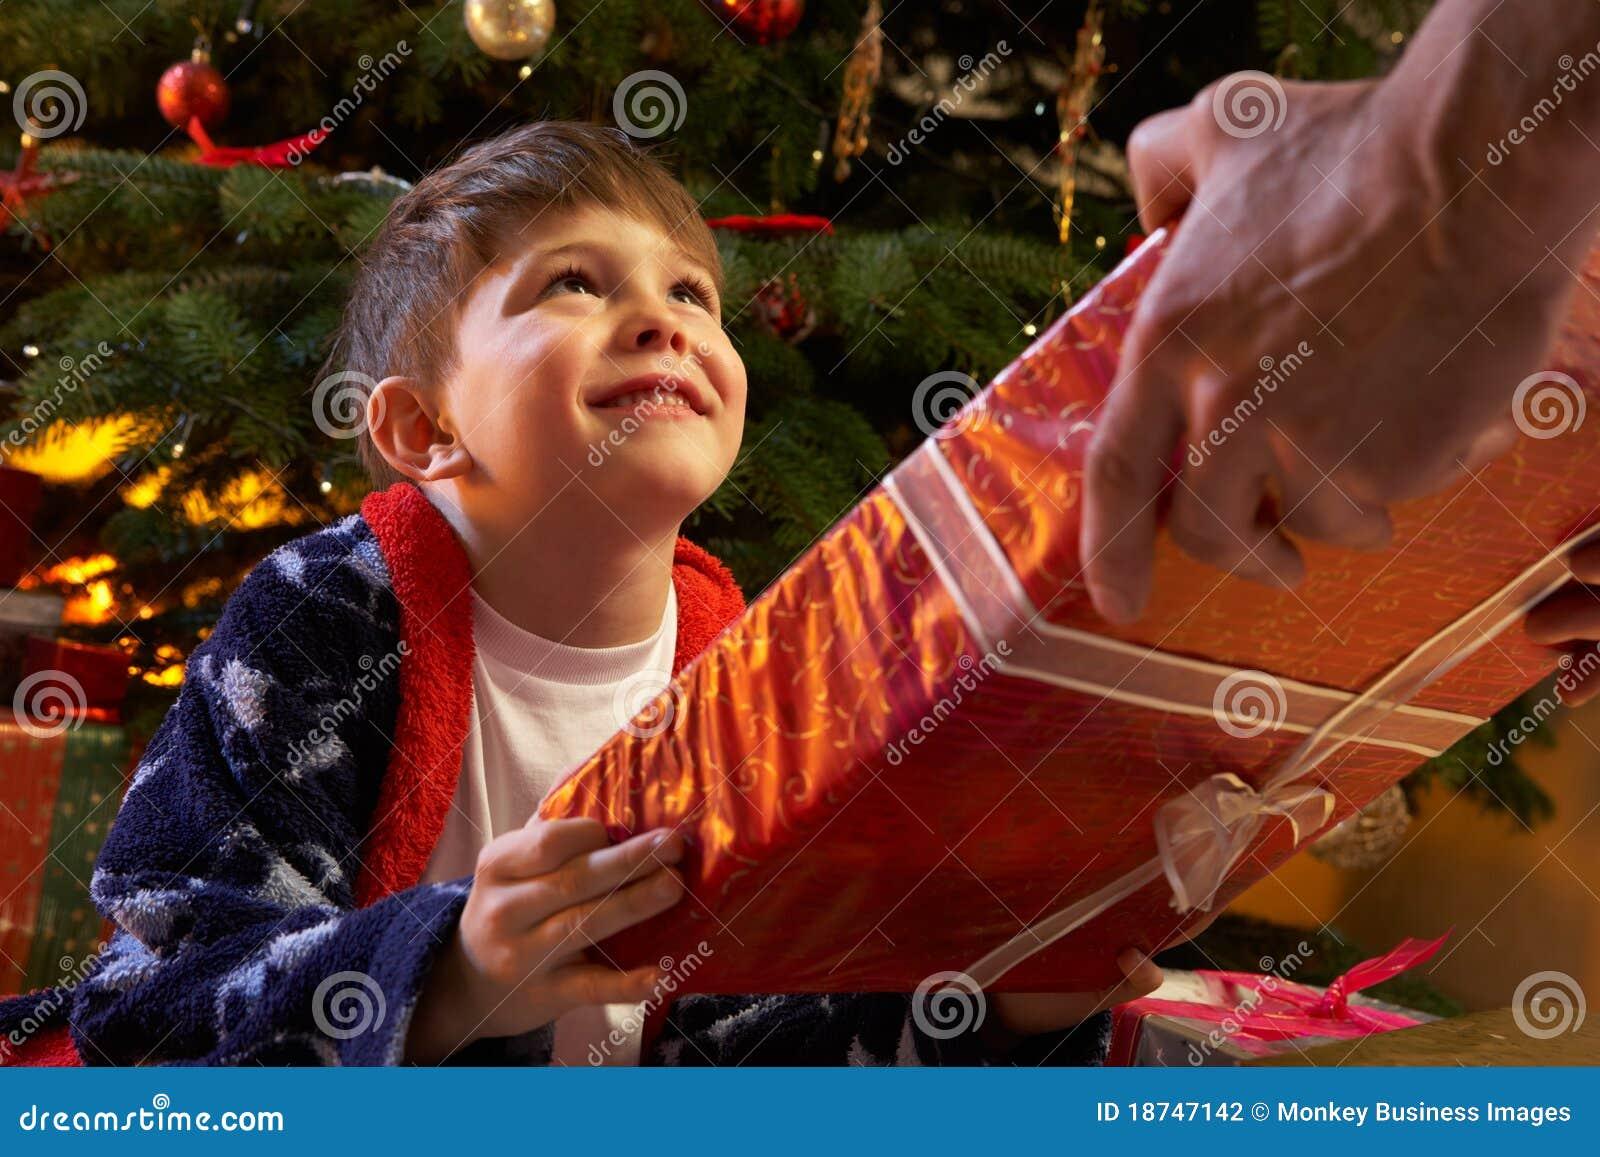 Young Boy Receiving Christmas Present